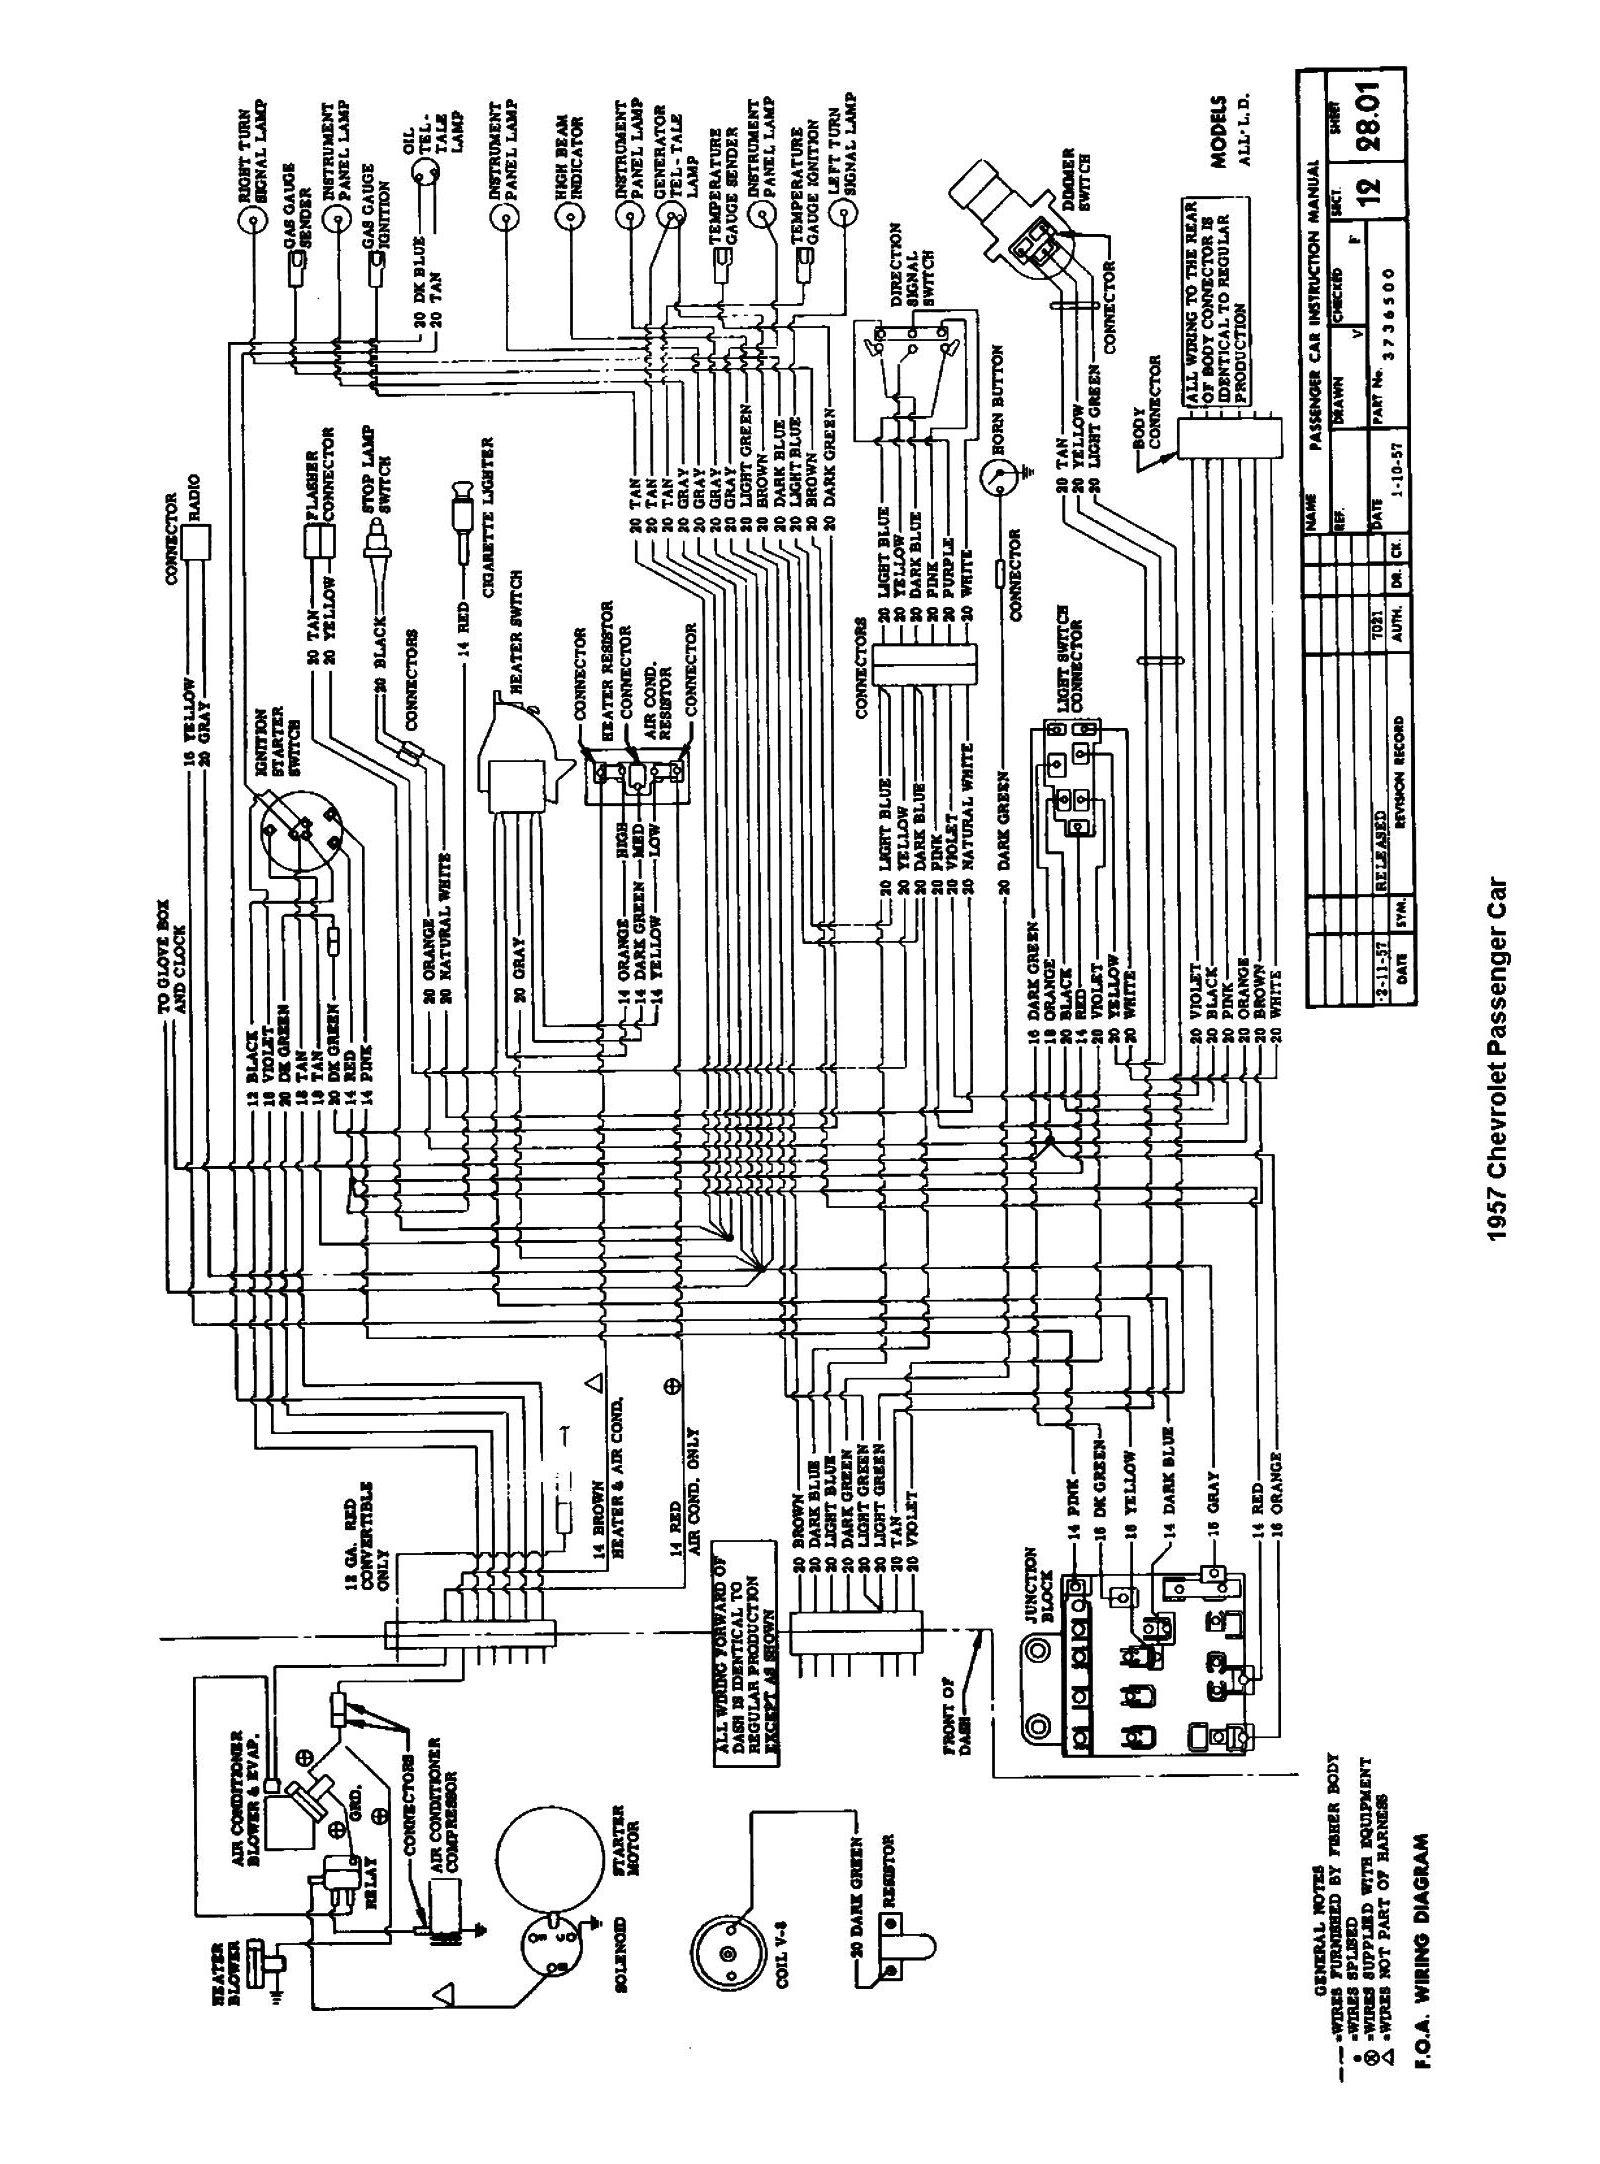 79 corvette electrical wiring diagram schematic